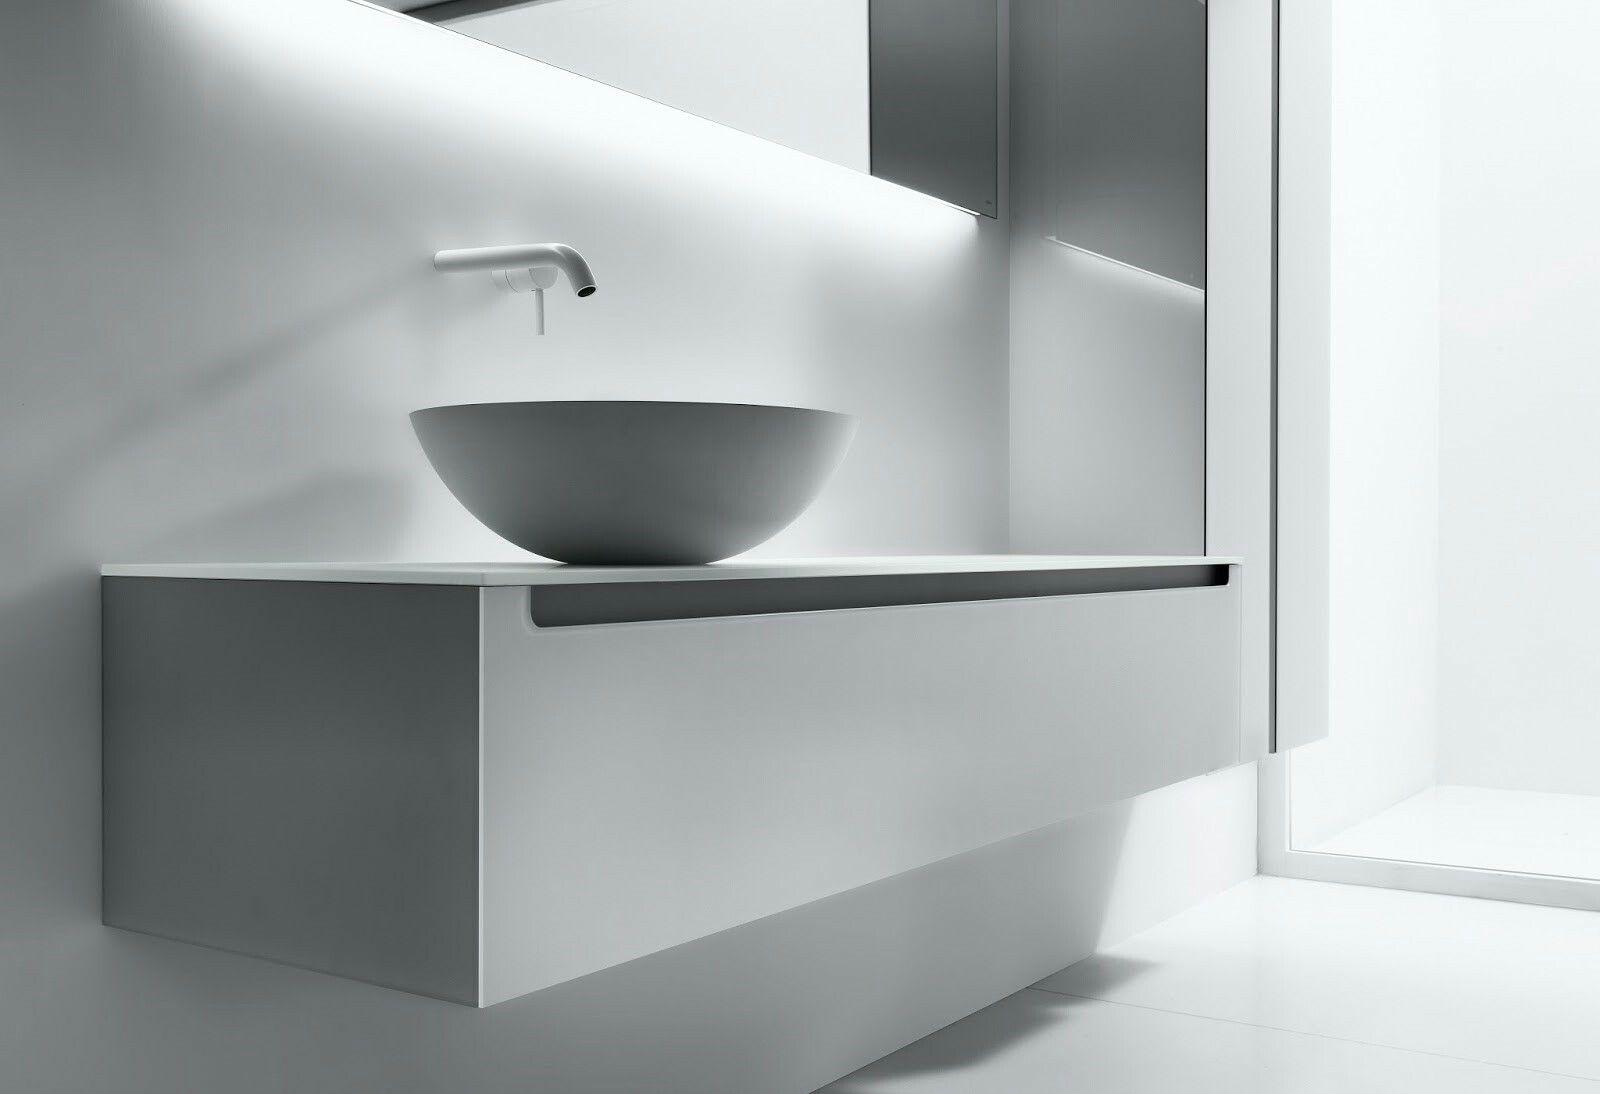 designermobel ideen monica armani, pin by ines on home | pinterest, Möbel ideen